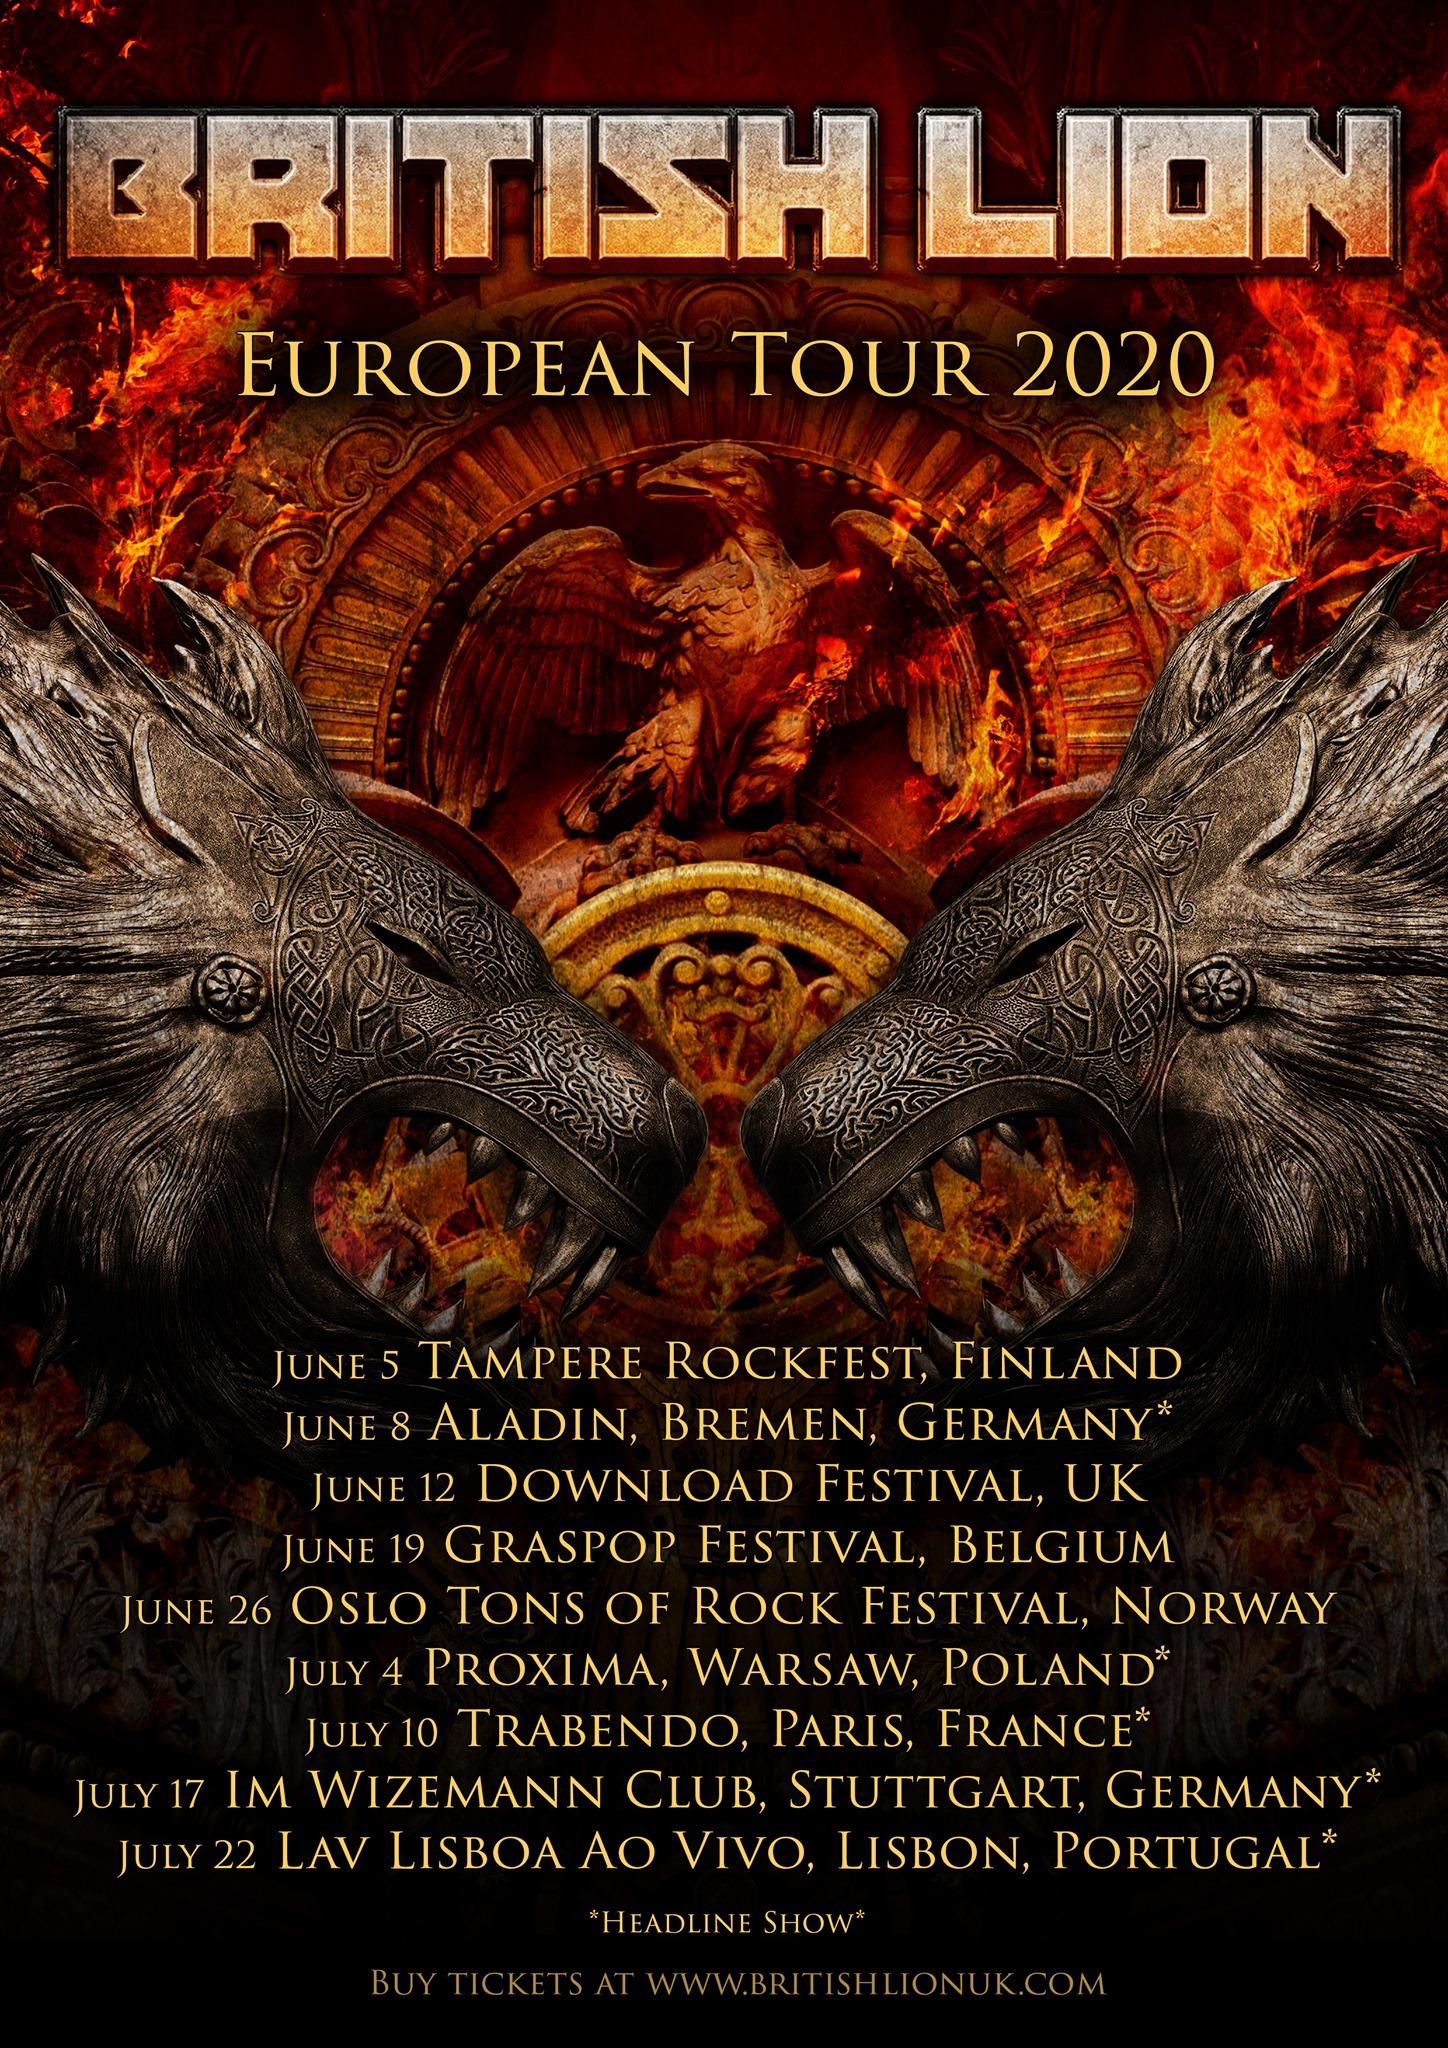 British Lion - European Tour 2020